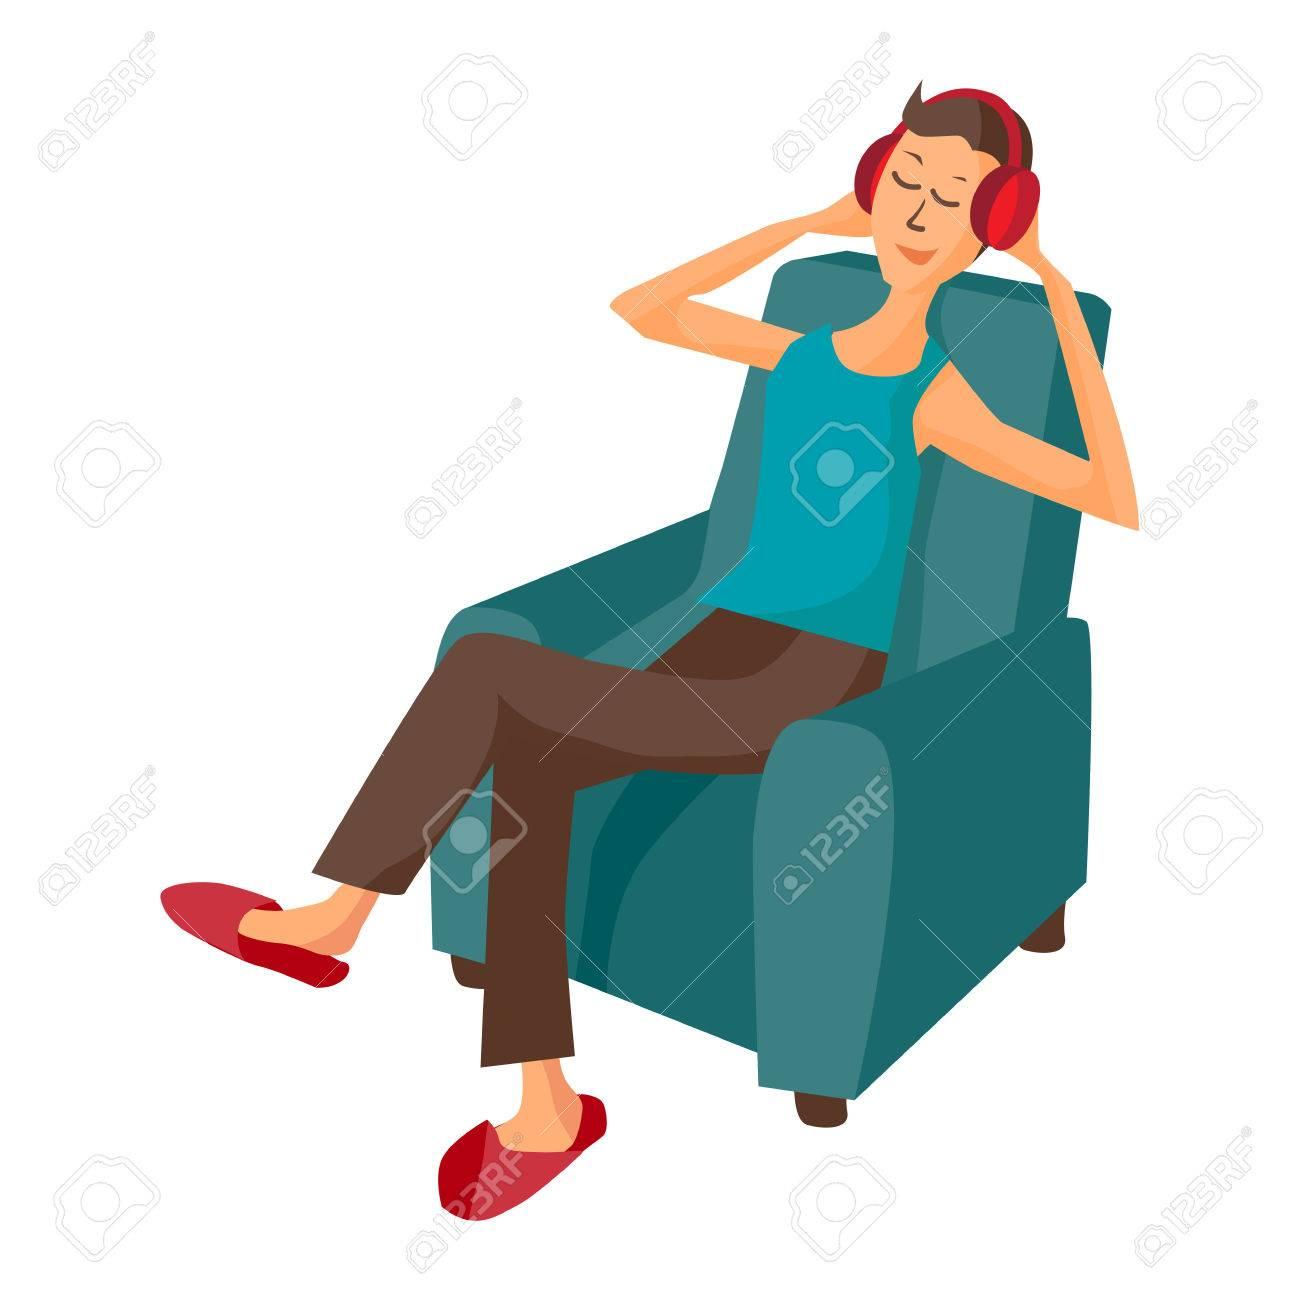 Cartoon Person Sitting In Chair